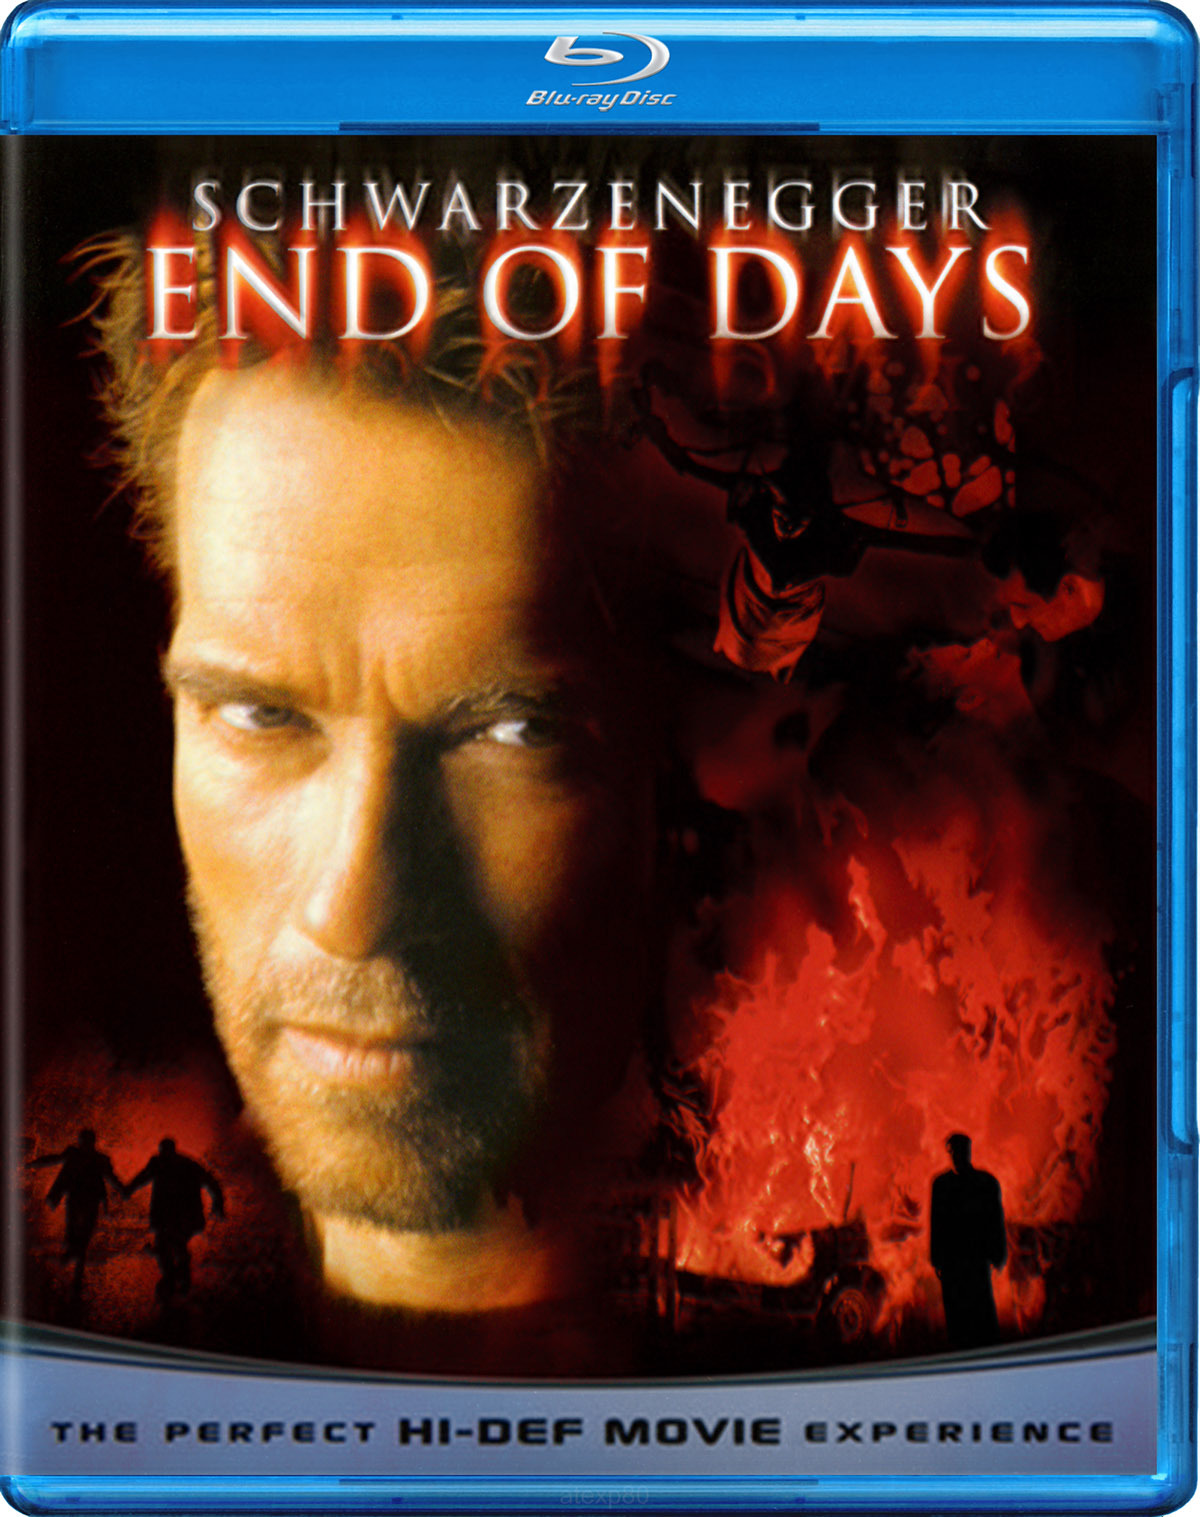 El dia final (End of days 1999) Full HD Dual Lat-ing sub